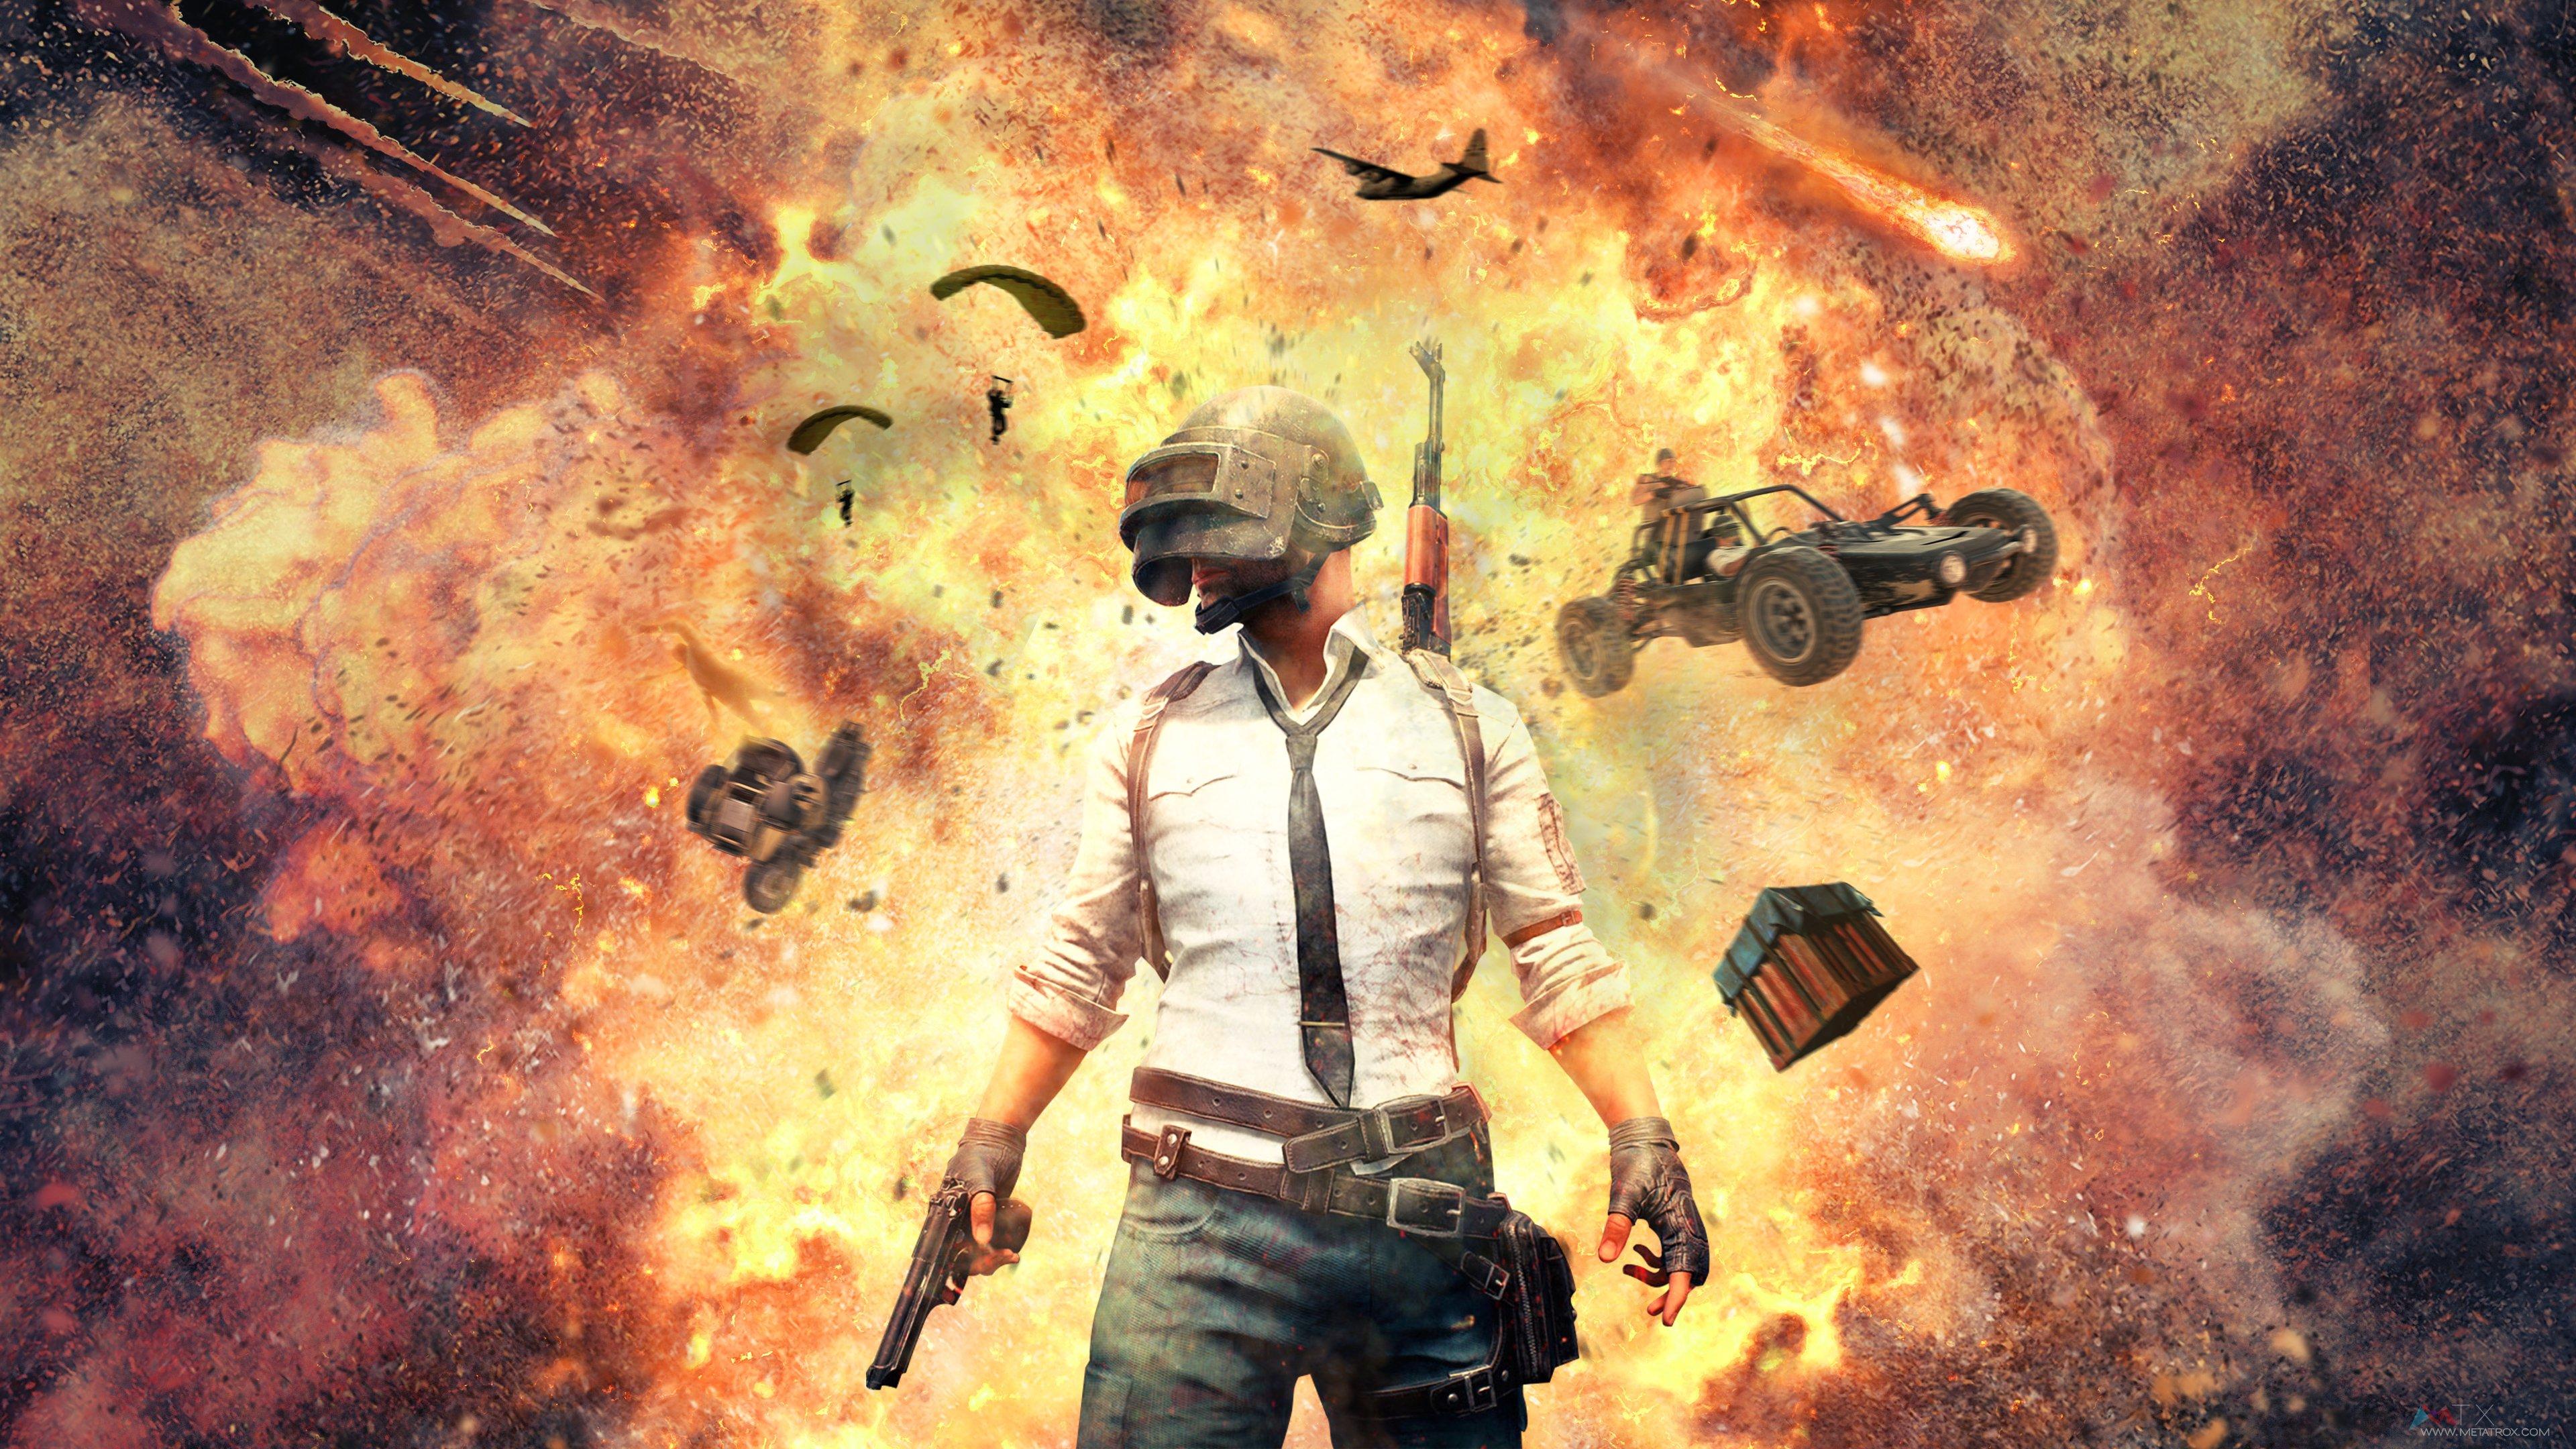 Fondos de pantalla PlayerUnknown's Battlegrounds